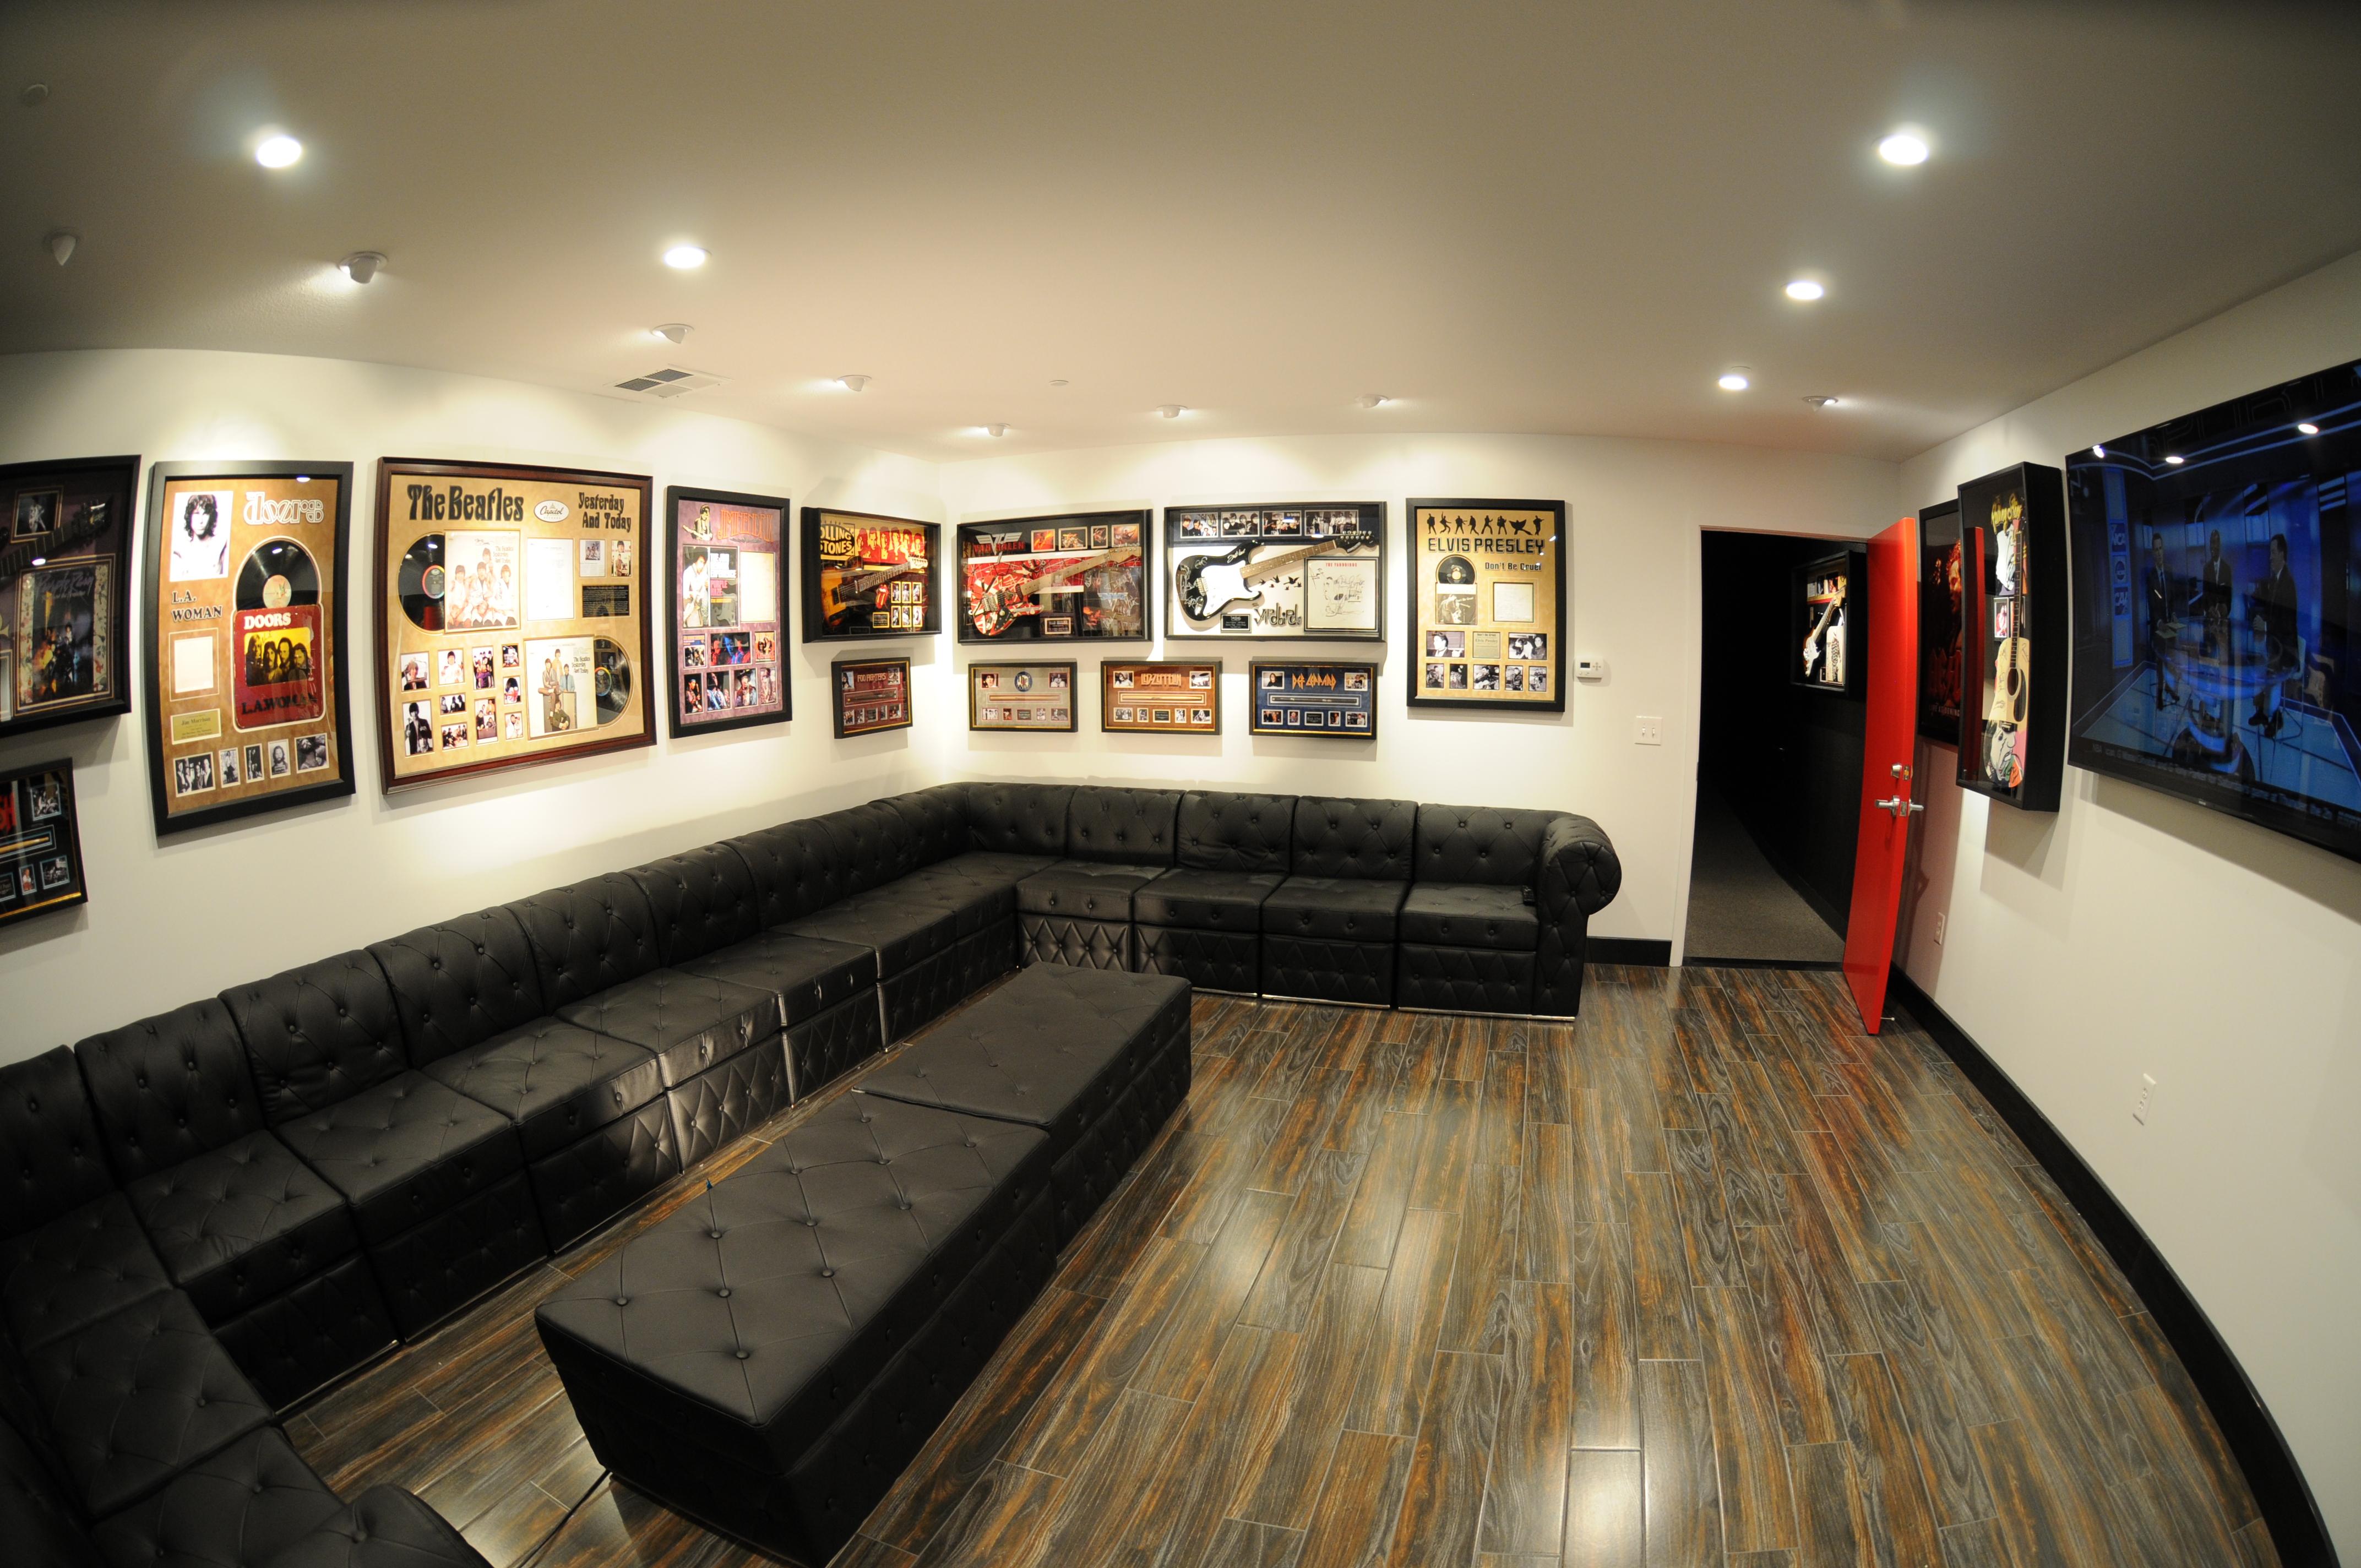 house of rock venue